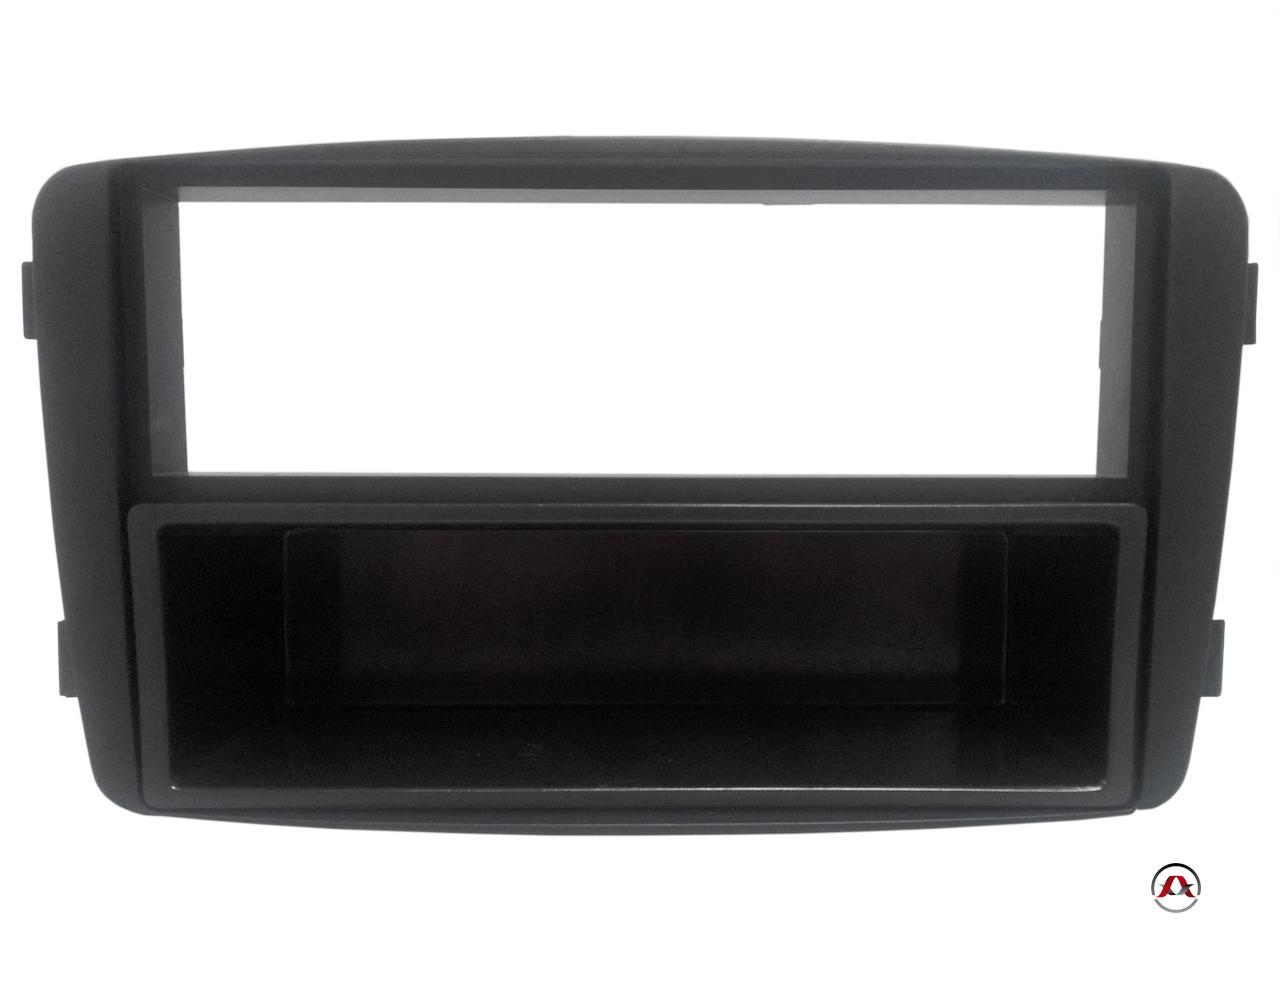 autoradio facade et supports mercedes adnautomid 1din classe c 00 04. Black Bedroom Furniture Sets. Home Design Ideas